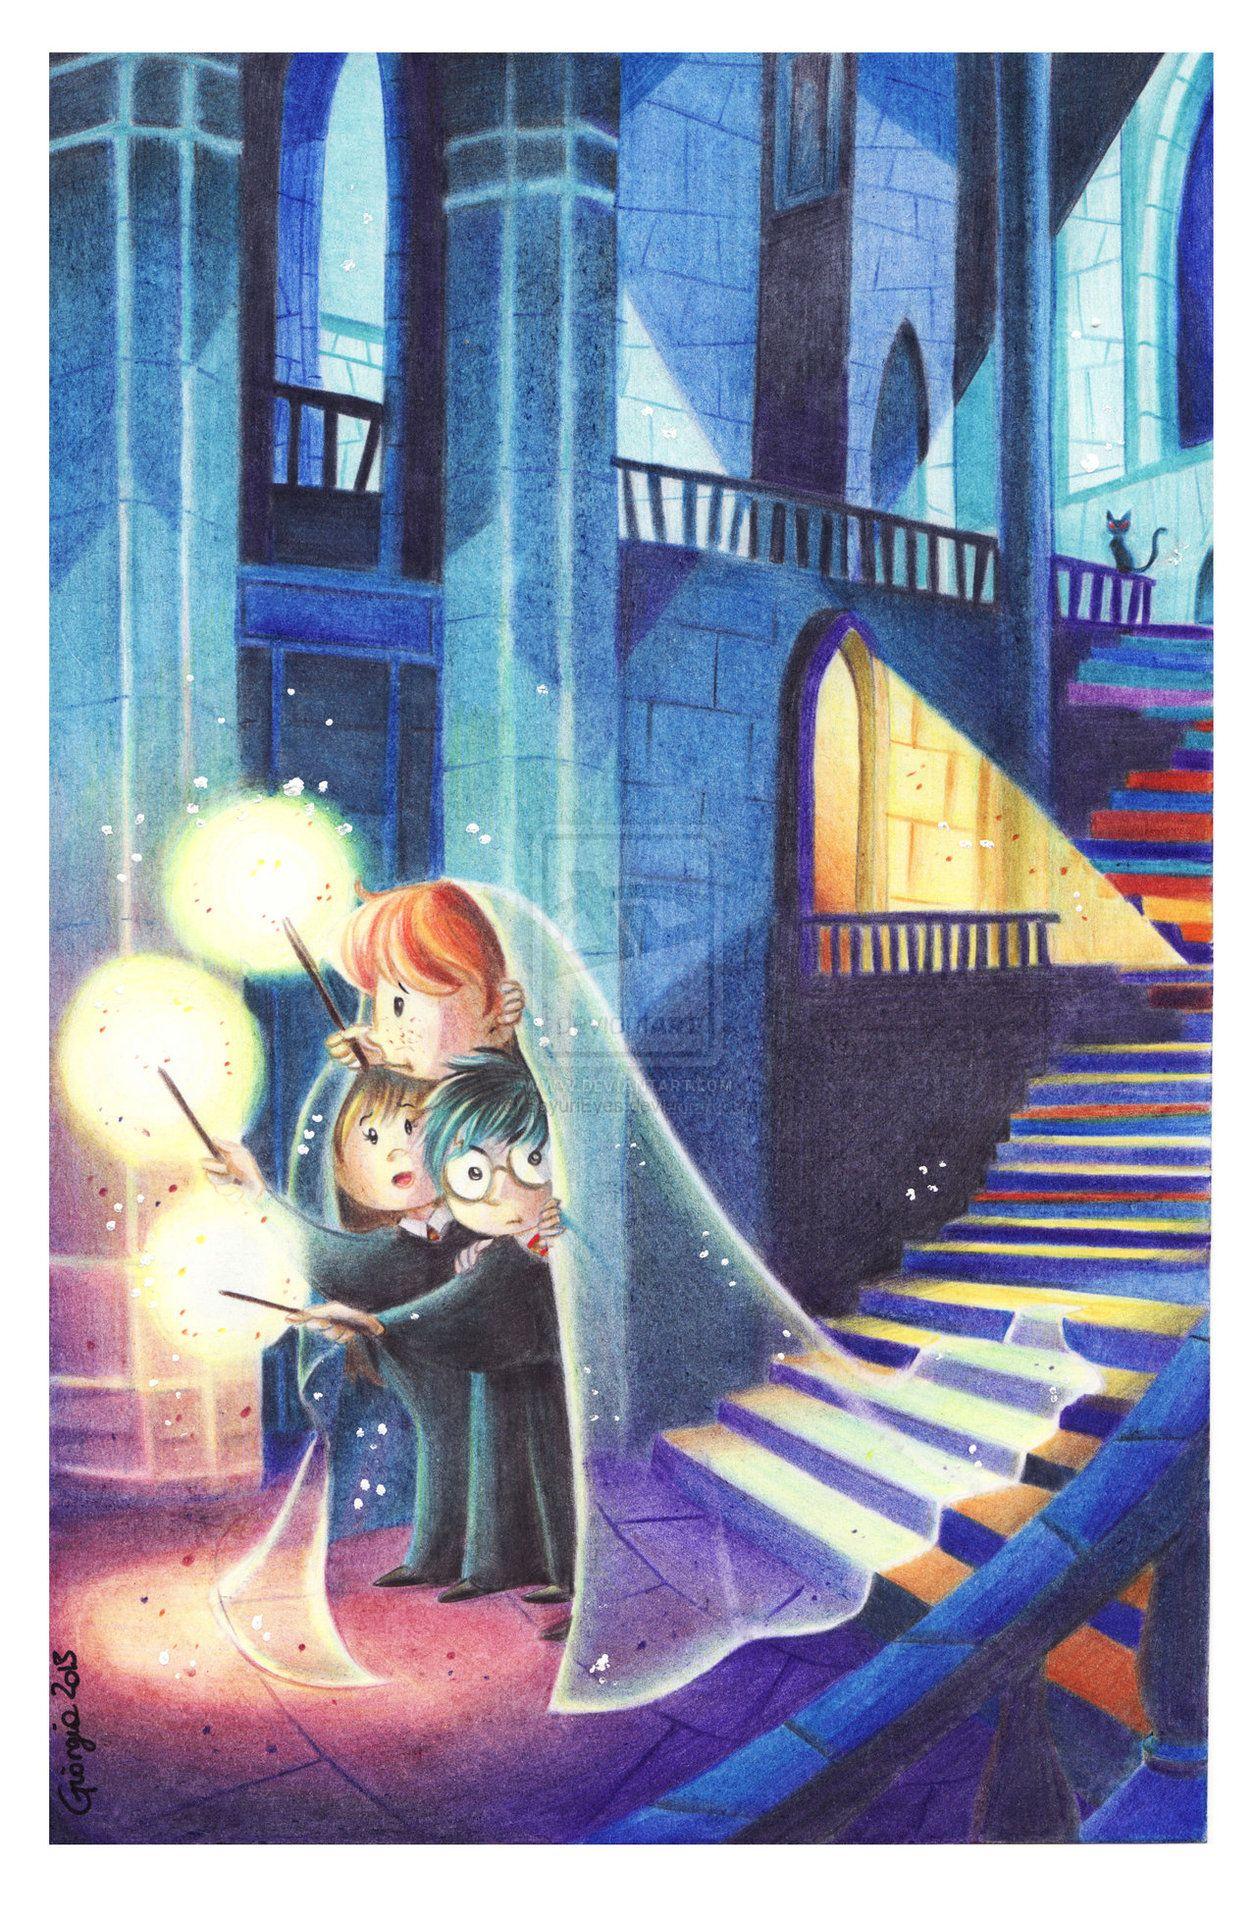 Amazing Wallpaper Harry Potter Fanart - 320e69dadfed2d3c66d1a43ba2105daa  Best Photo Reference_139068.jpg